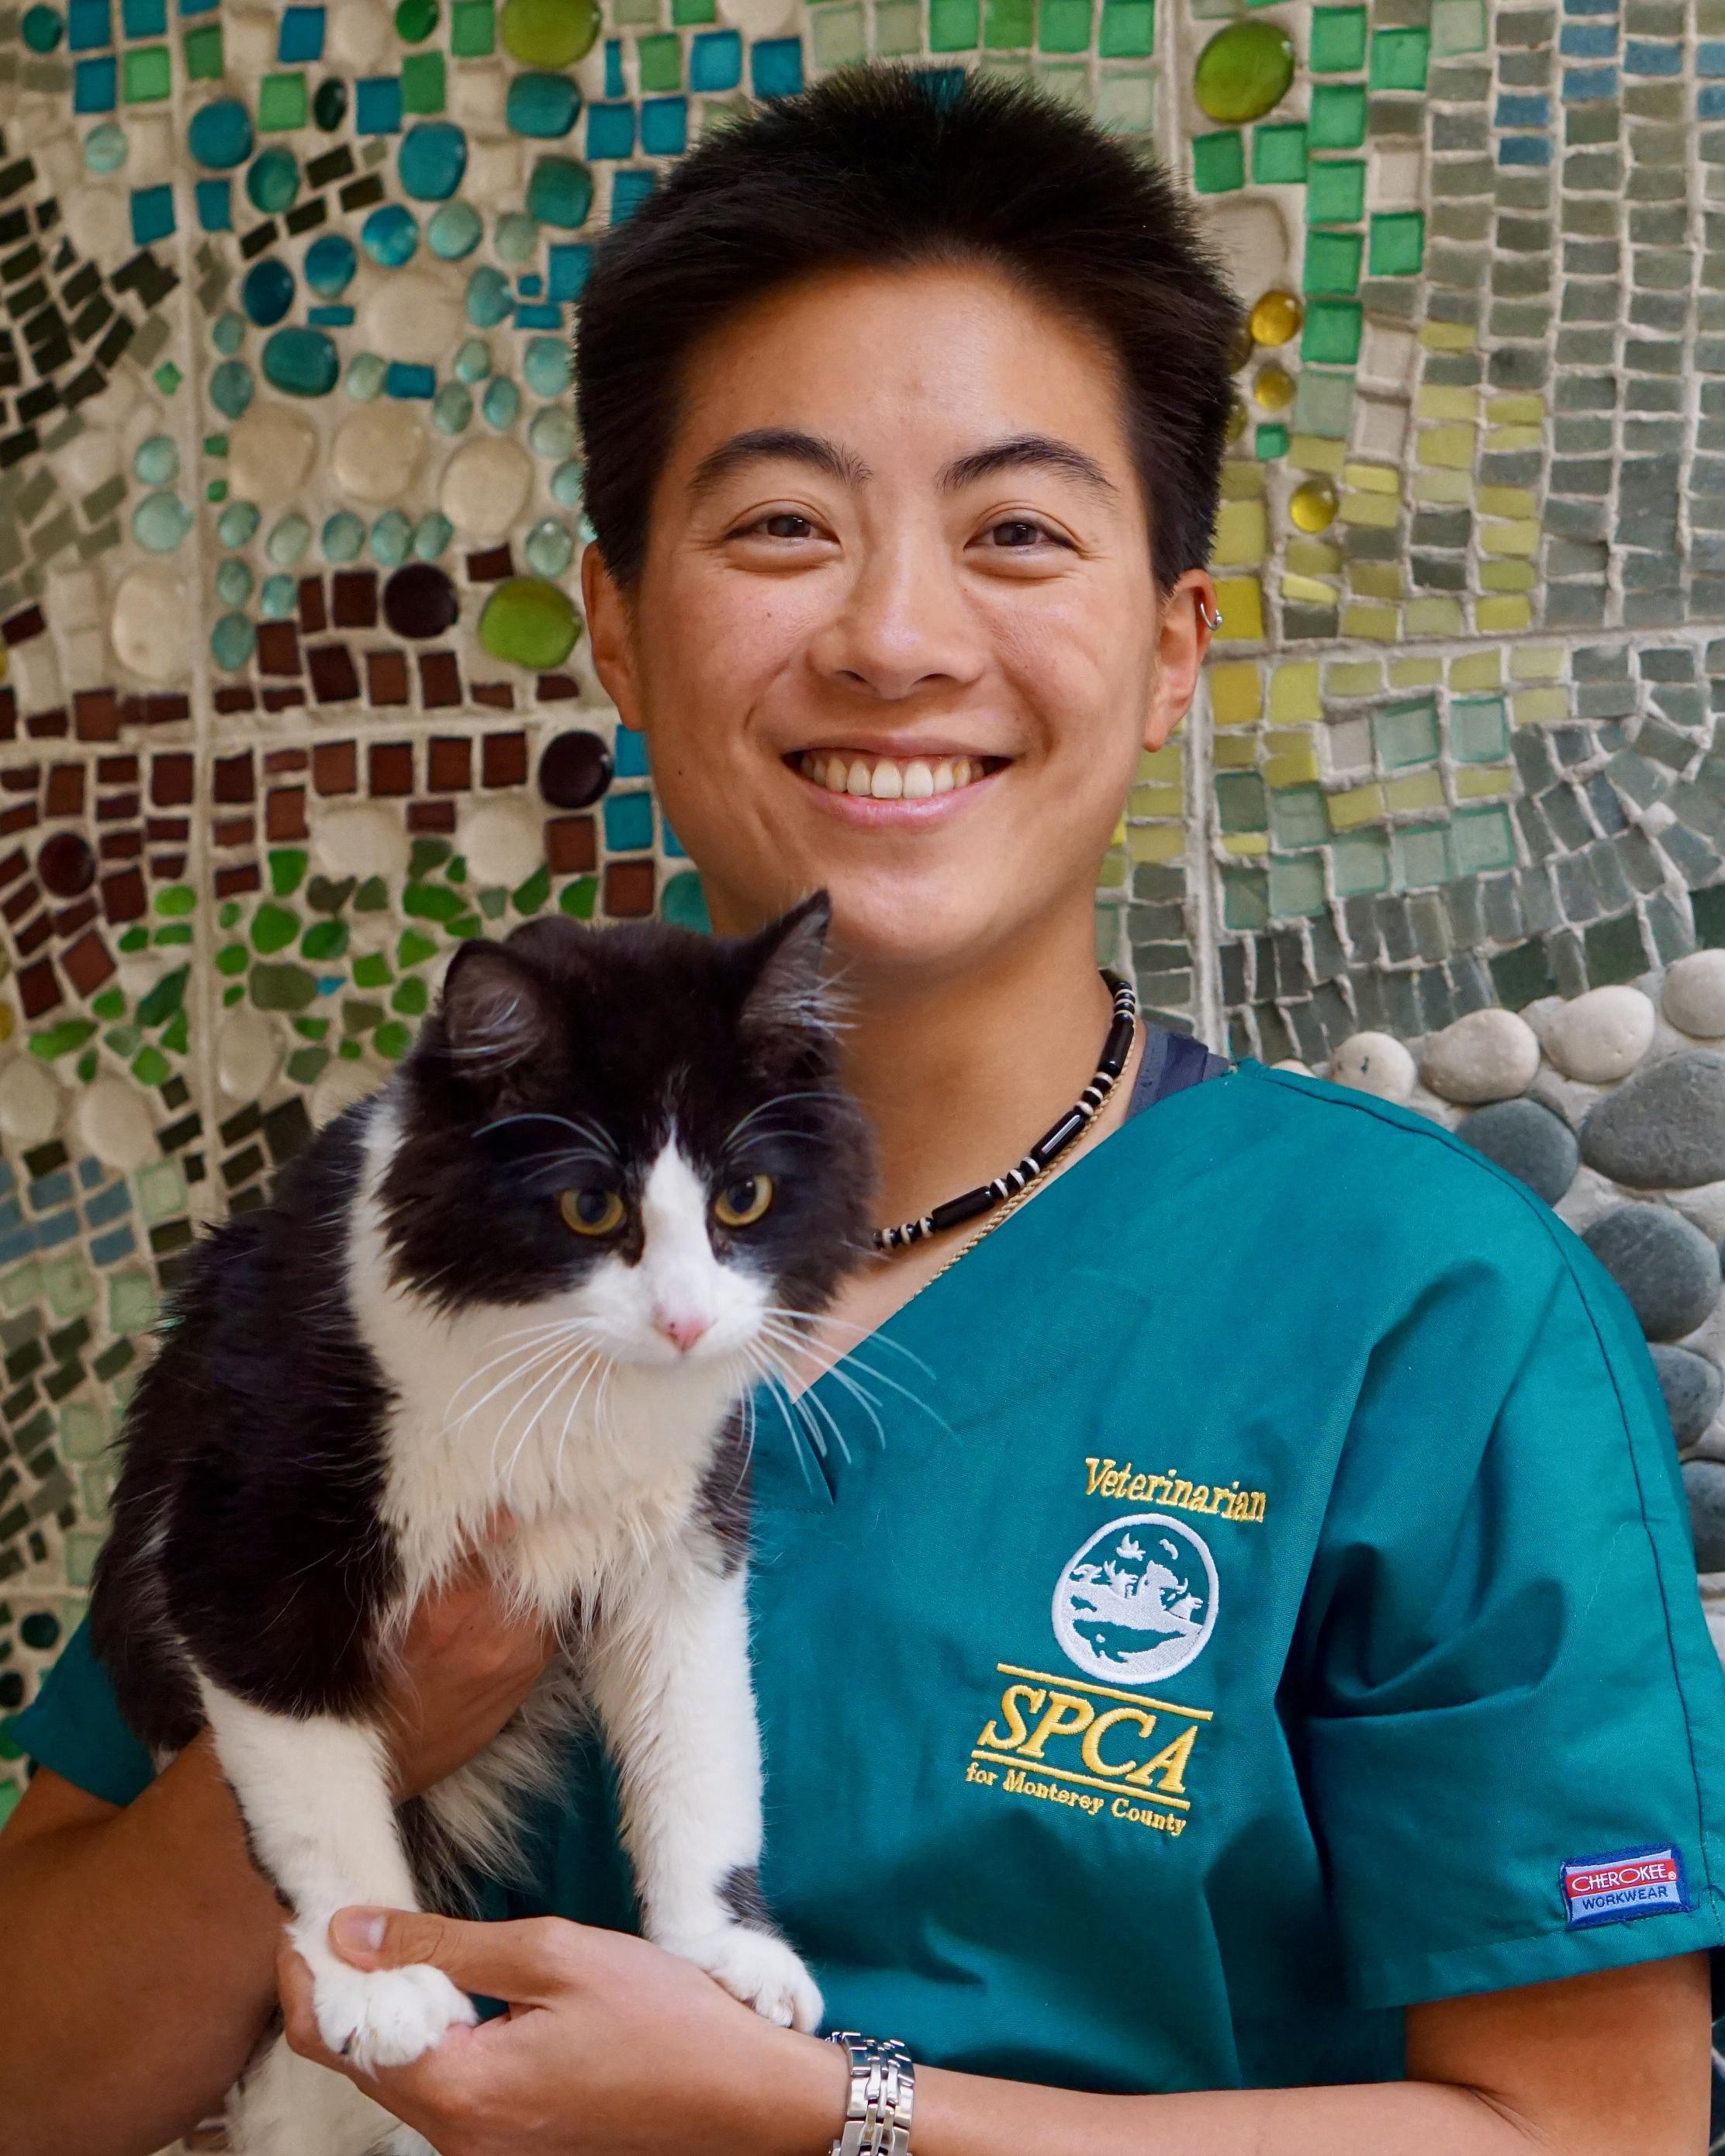 Your Veterinary Team